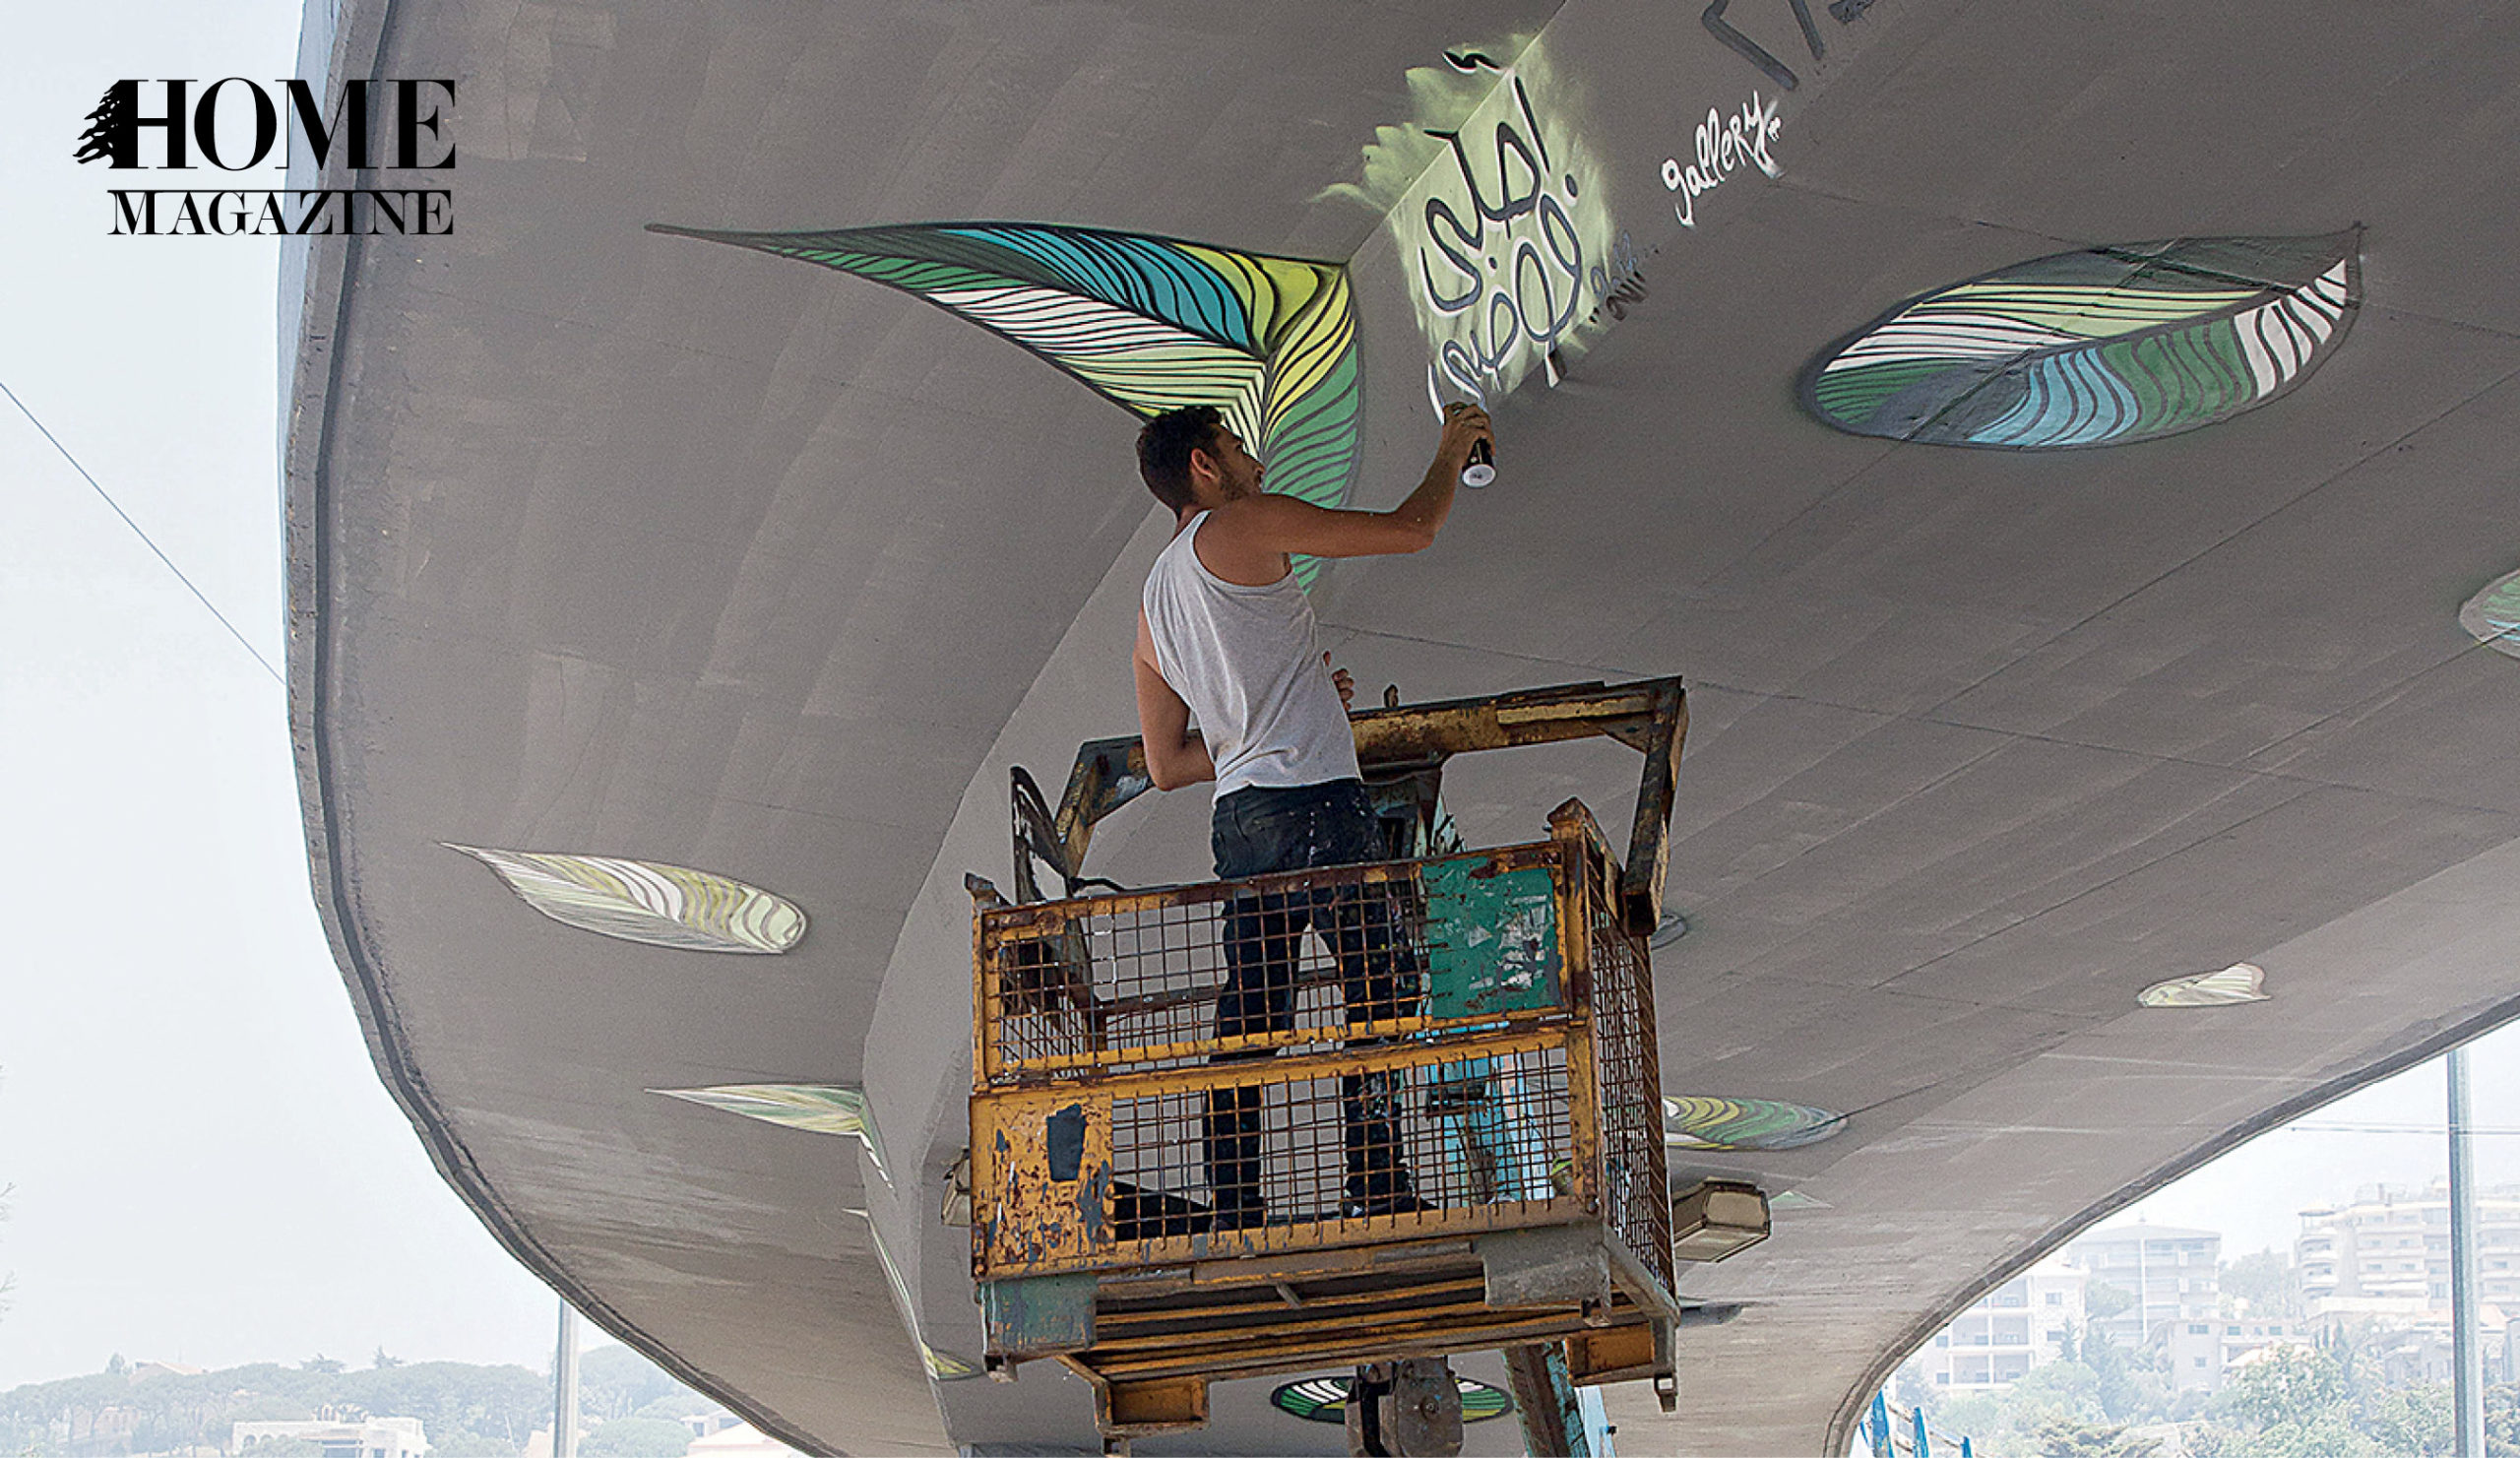 Man painting on bridge